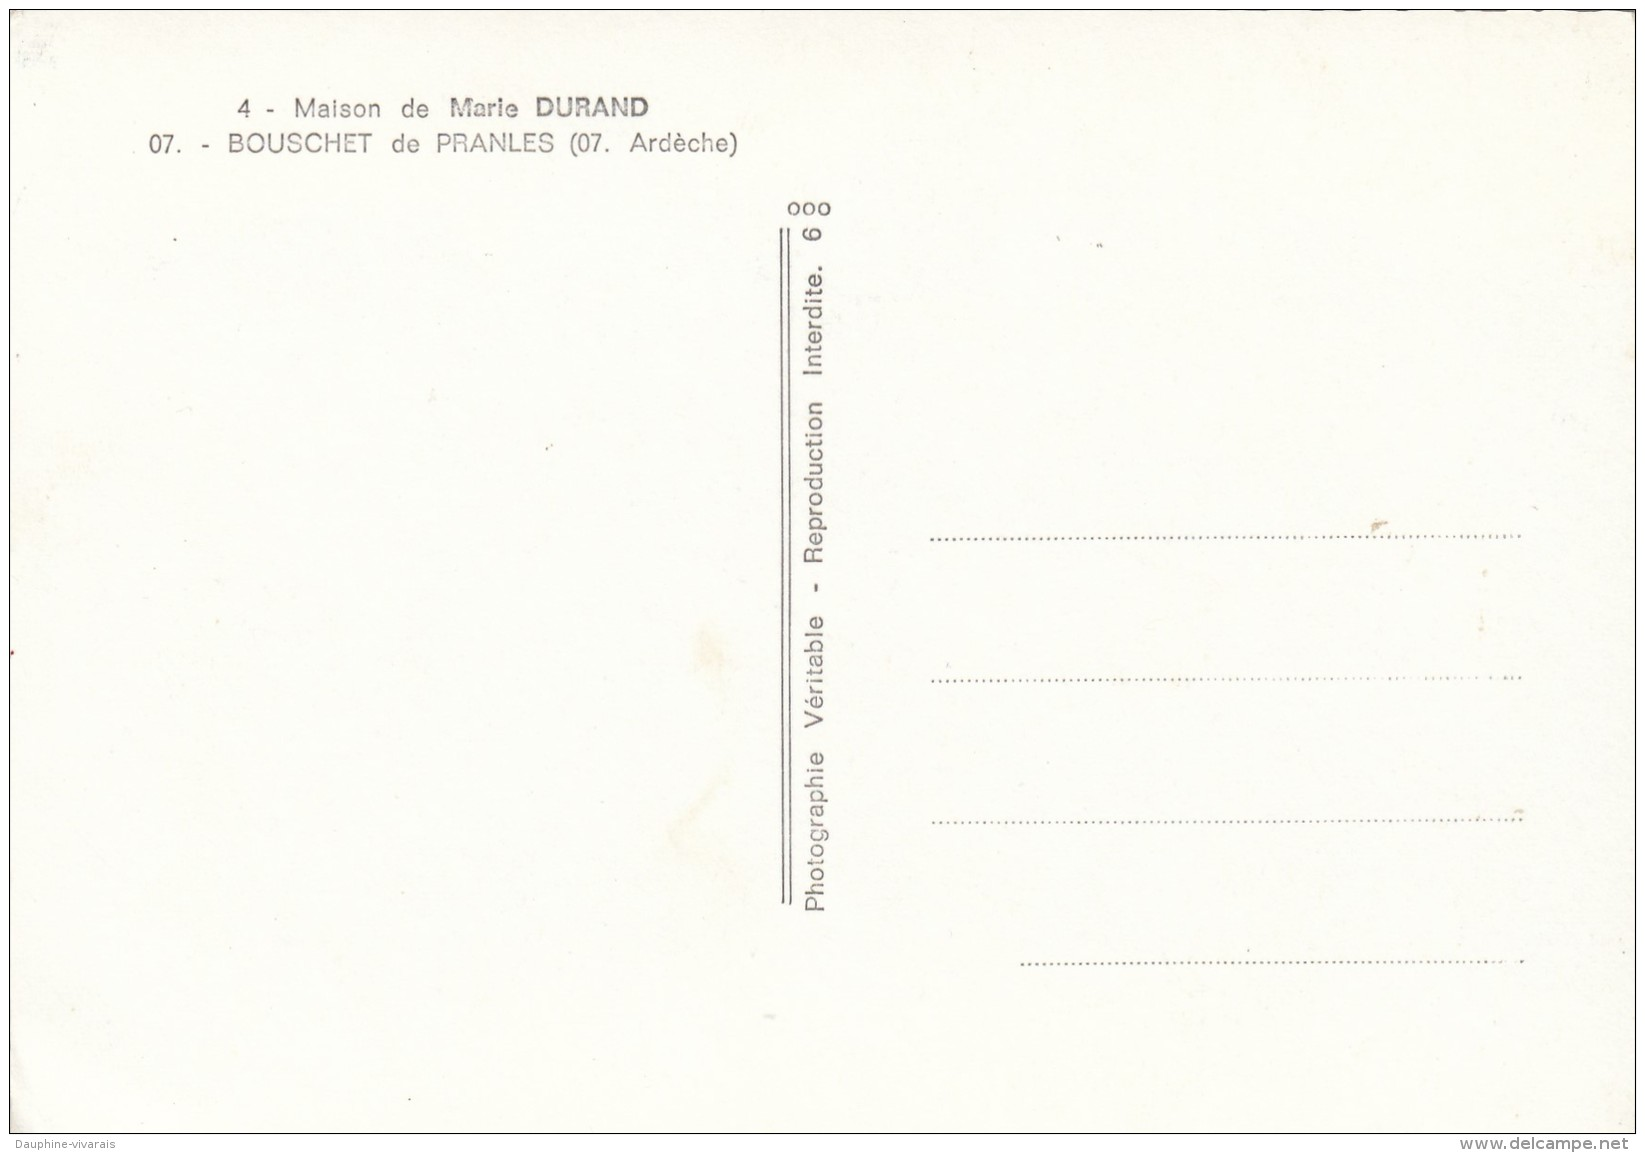 CP BOUCHET DE PRANLES  07 ARDECHE  MAISON DE MARIE DURAND - Andere Gemeenten